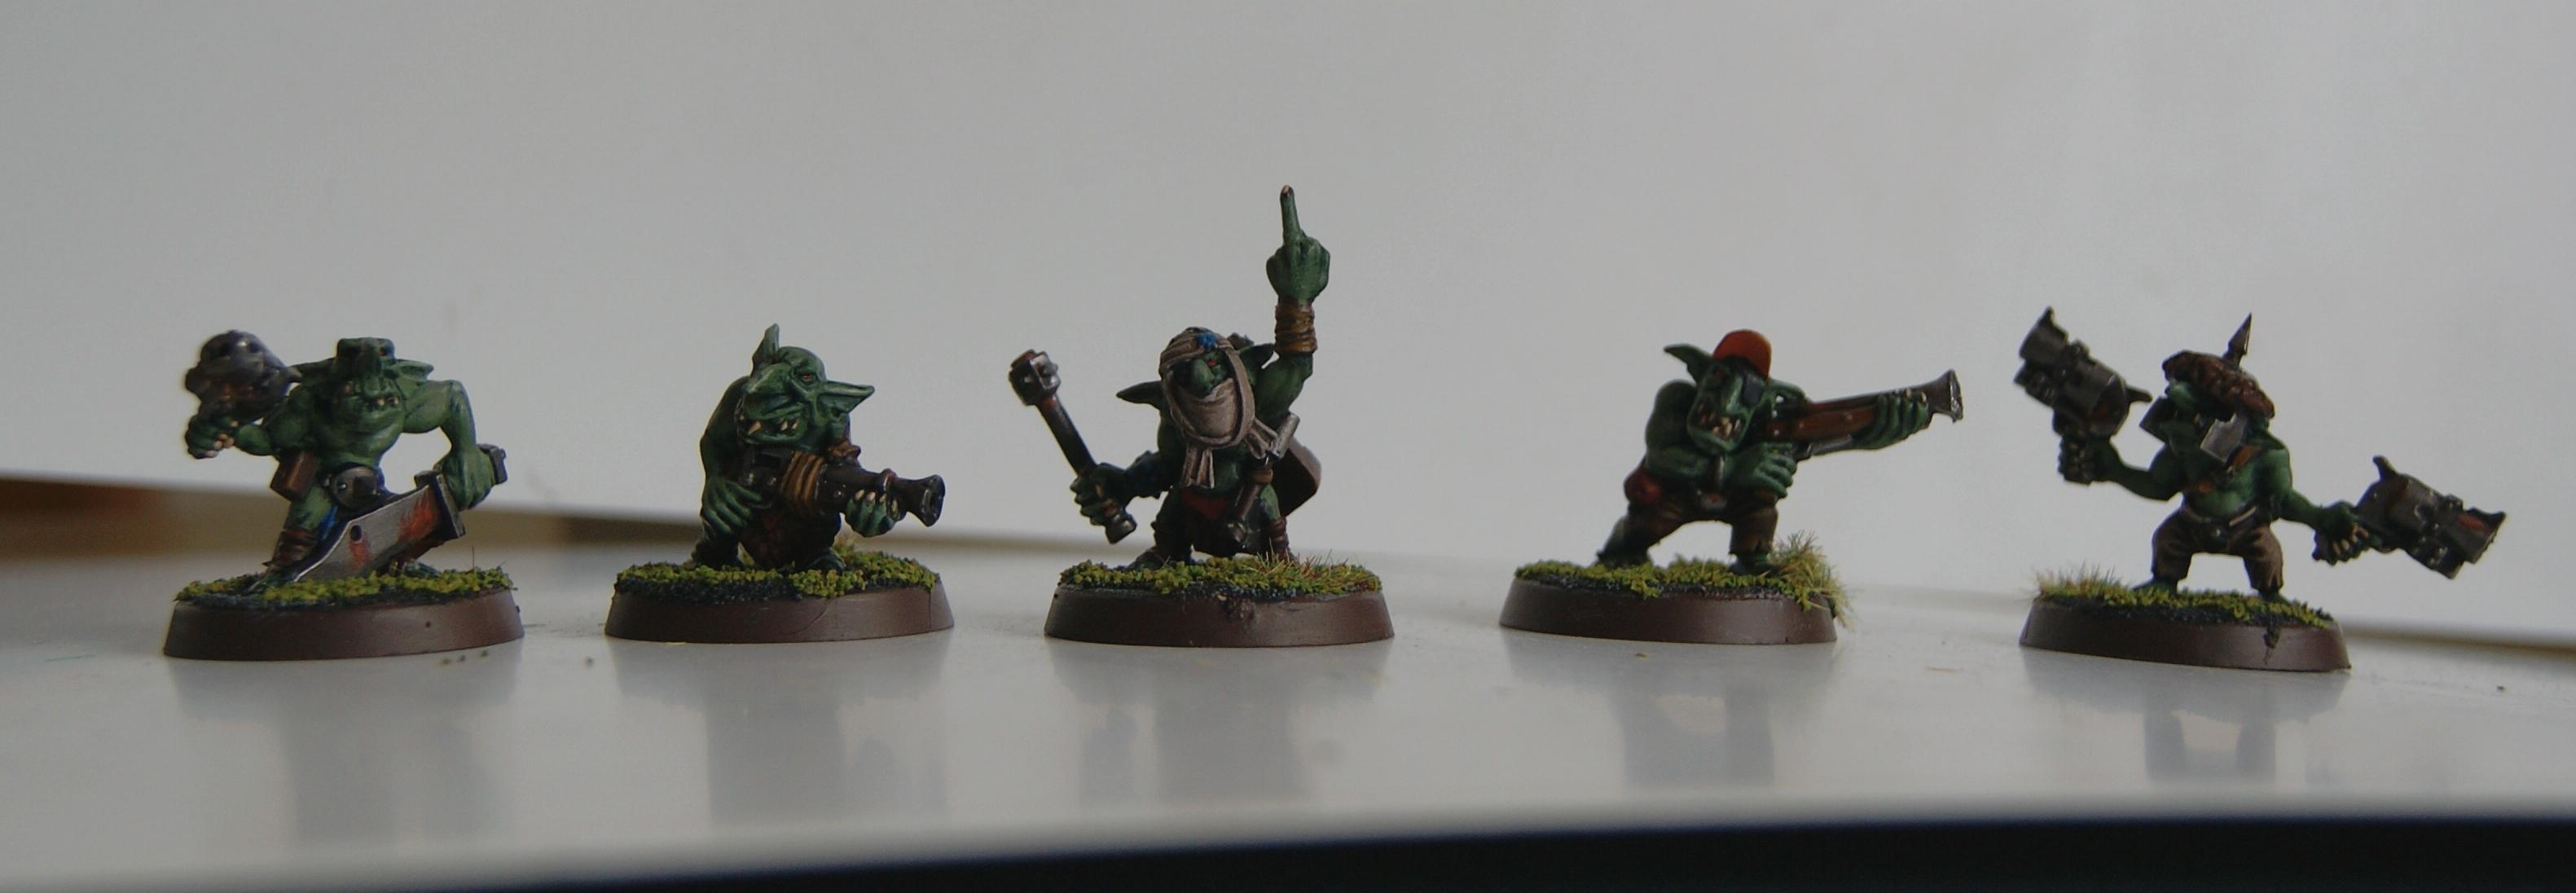 Gretchin, Grot Rebellion, Grot Rebels, Grots, Warhammer 40,000